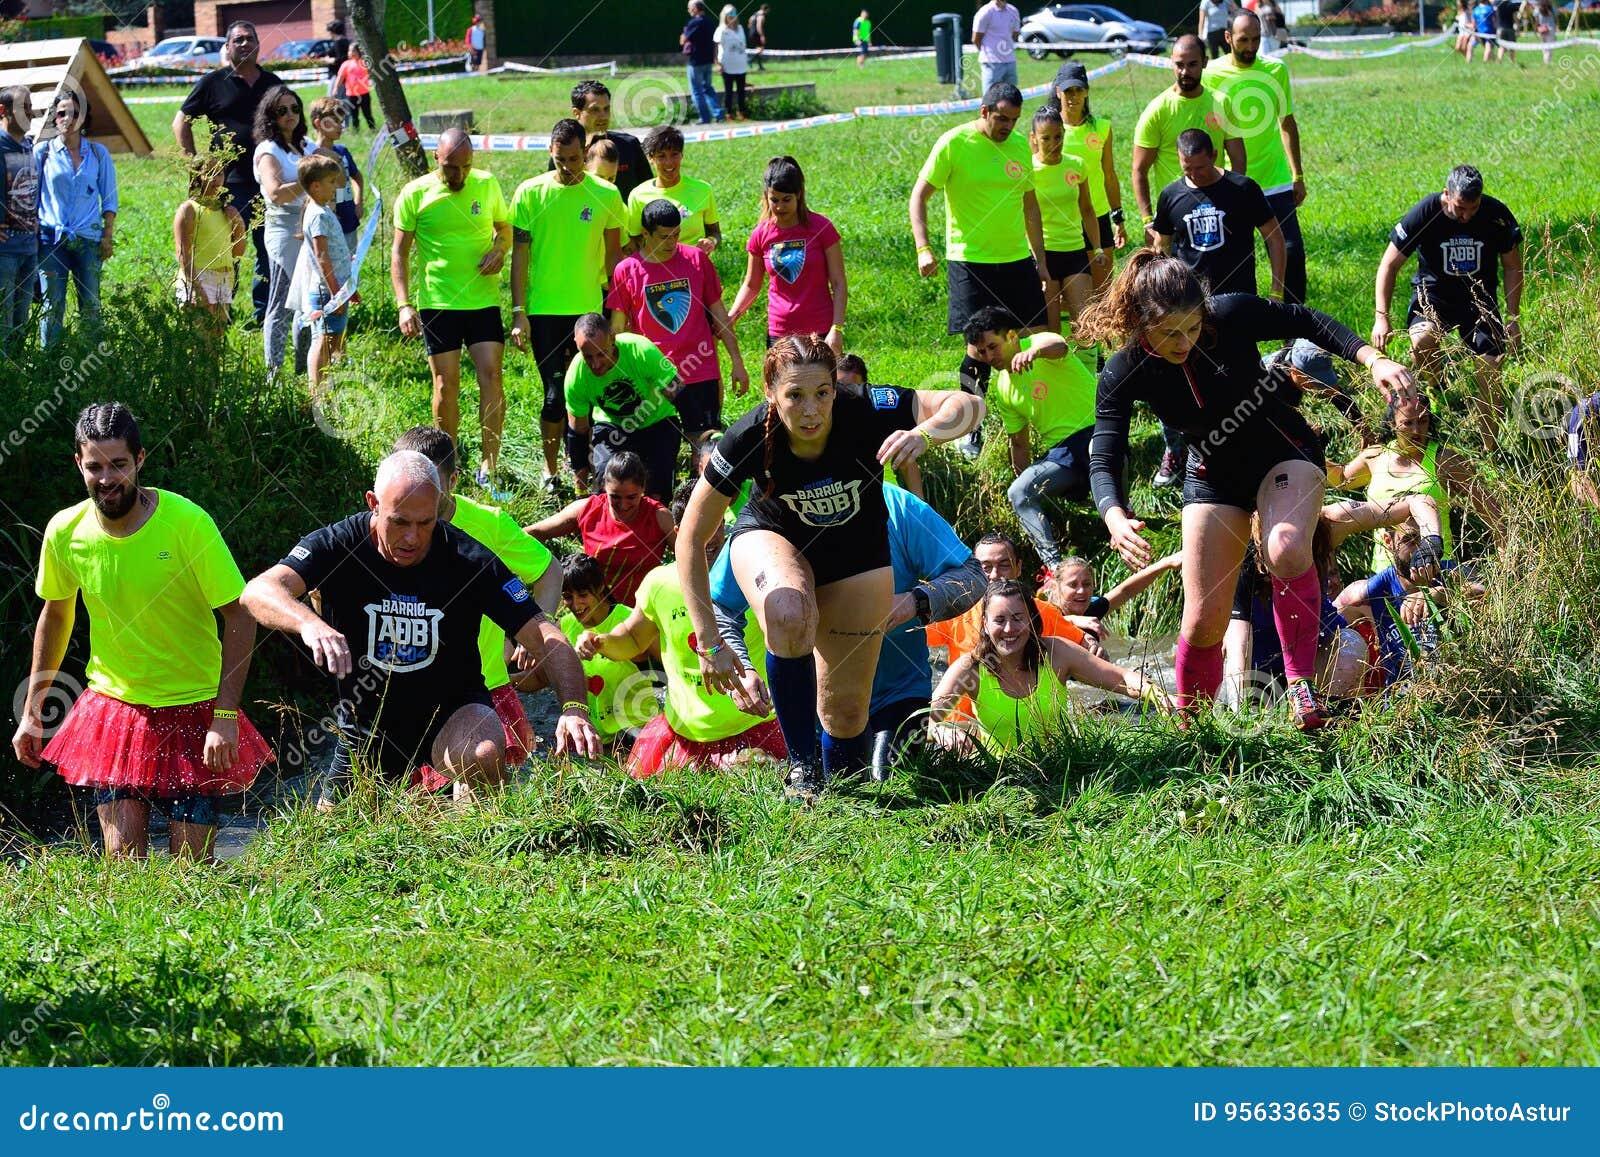 Gladiador Race - raça de obstáculo extrema no La Fresneda, Espanha